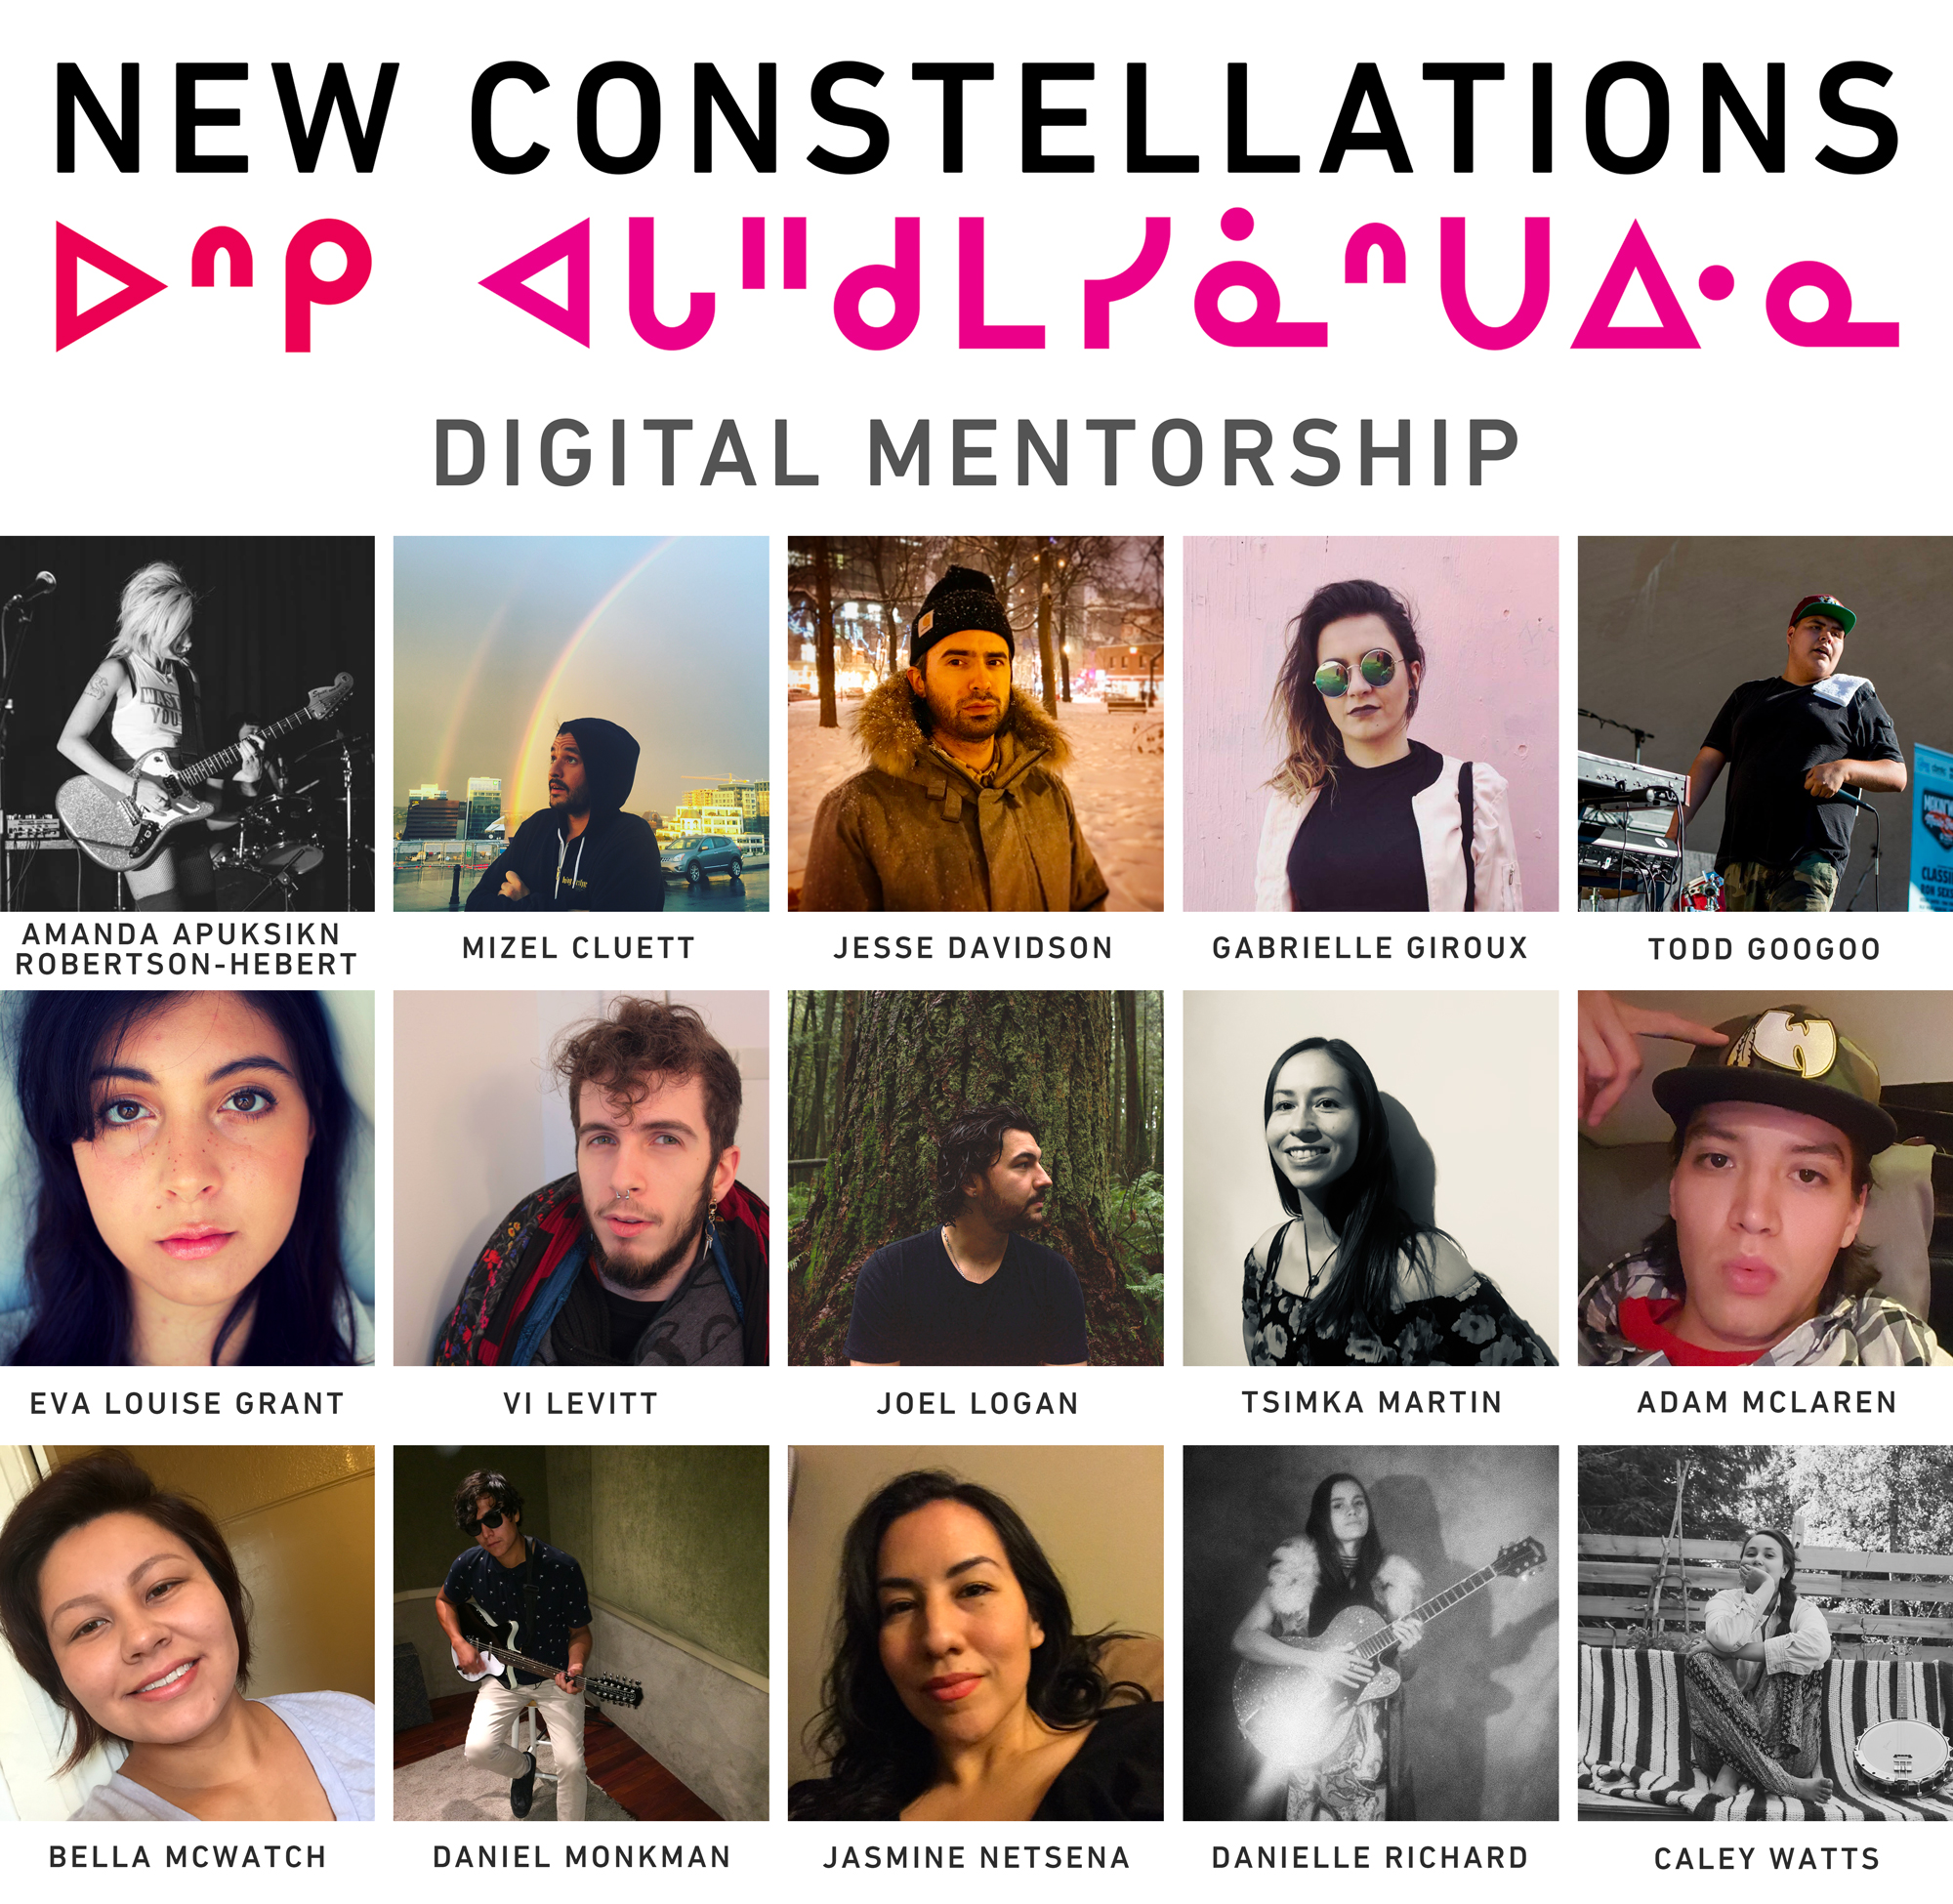 Digital-Mentorship-Grid.jpg